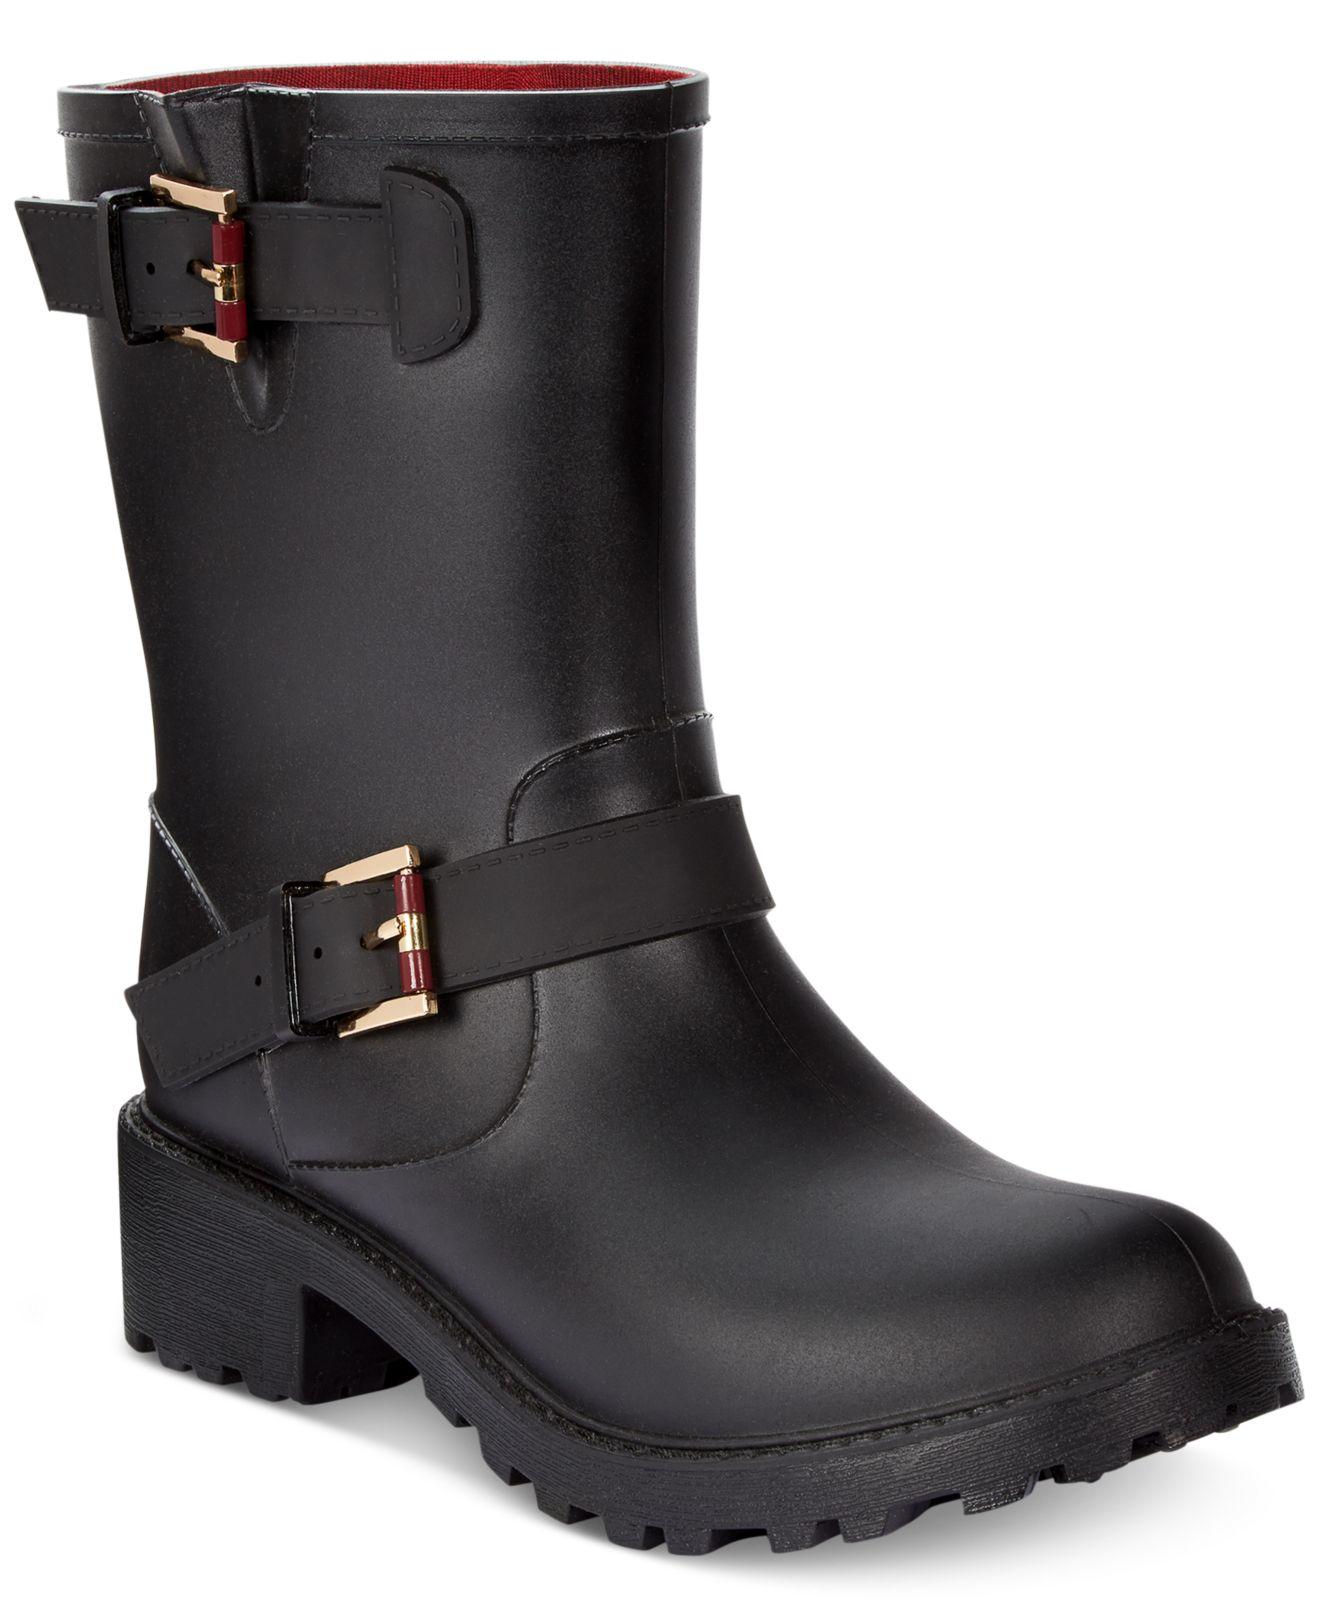 tommy hilfiger dew moto rain boots in black lyst. Black Bedroom Furniture Sets. Home Design Ideas